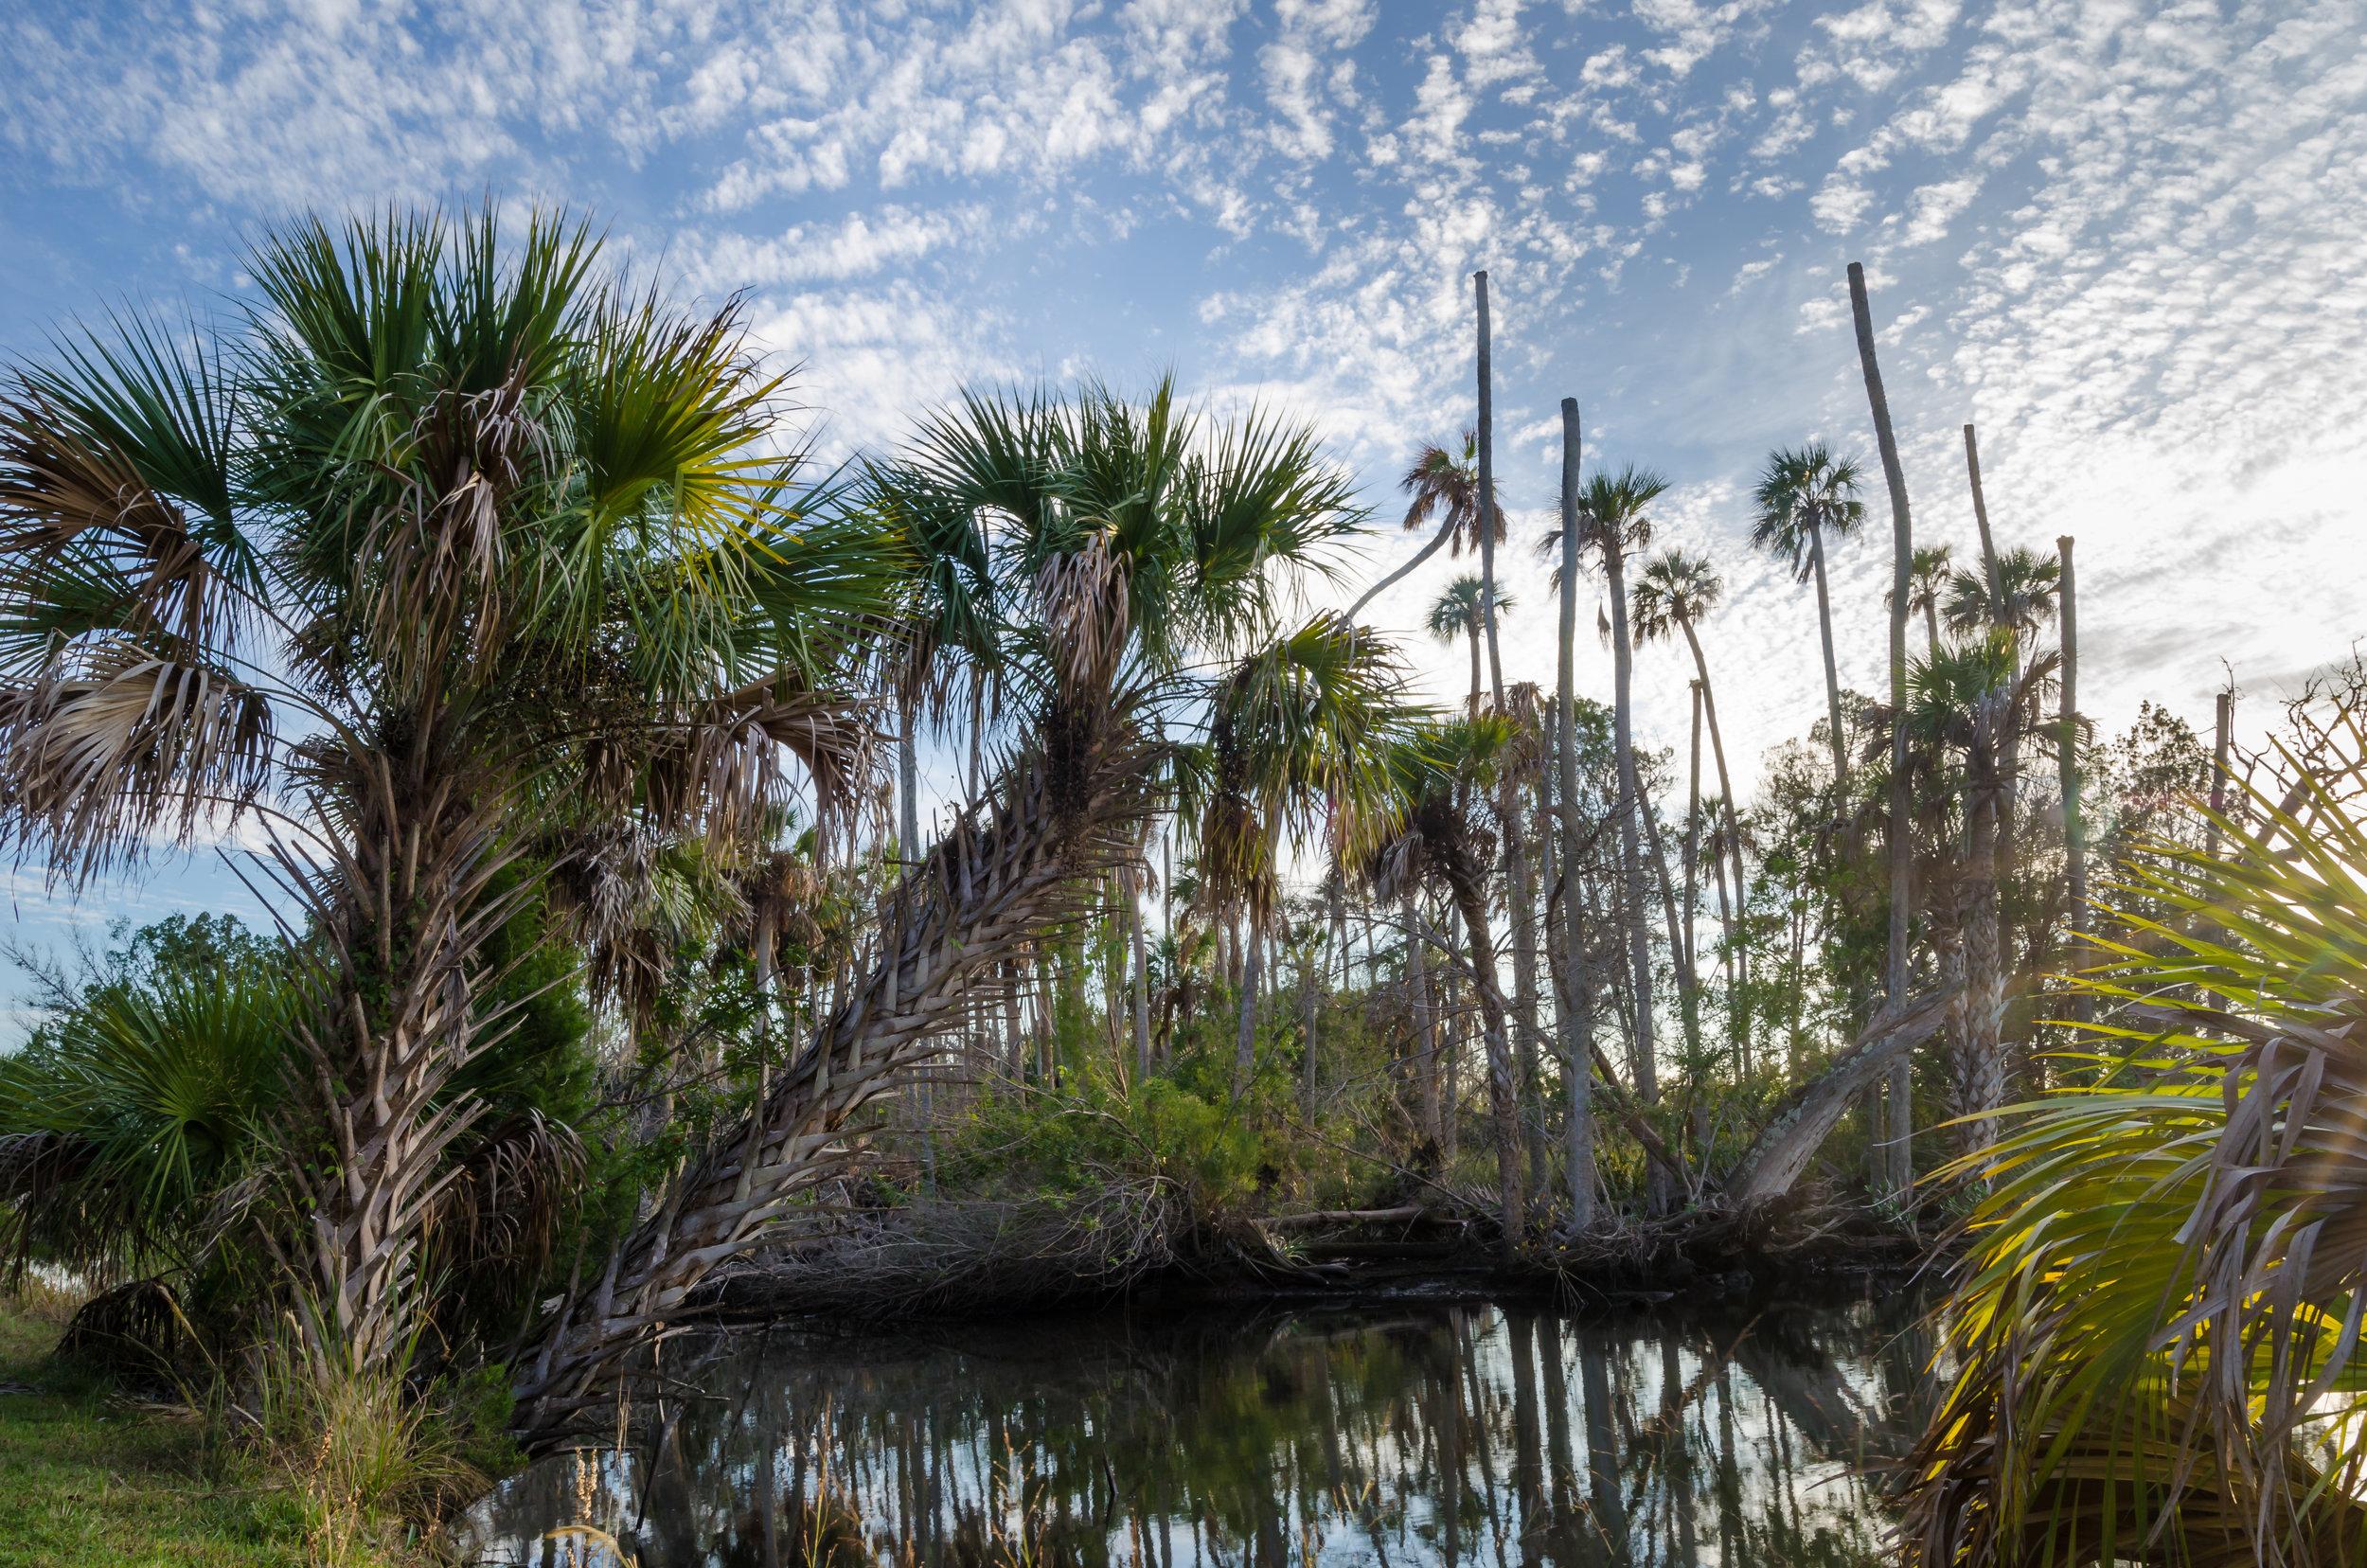 prehistoric-crystal river preserve-palm trees-citrus county-florida.jpg